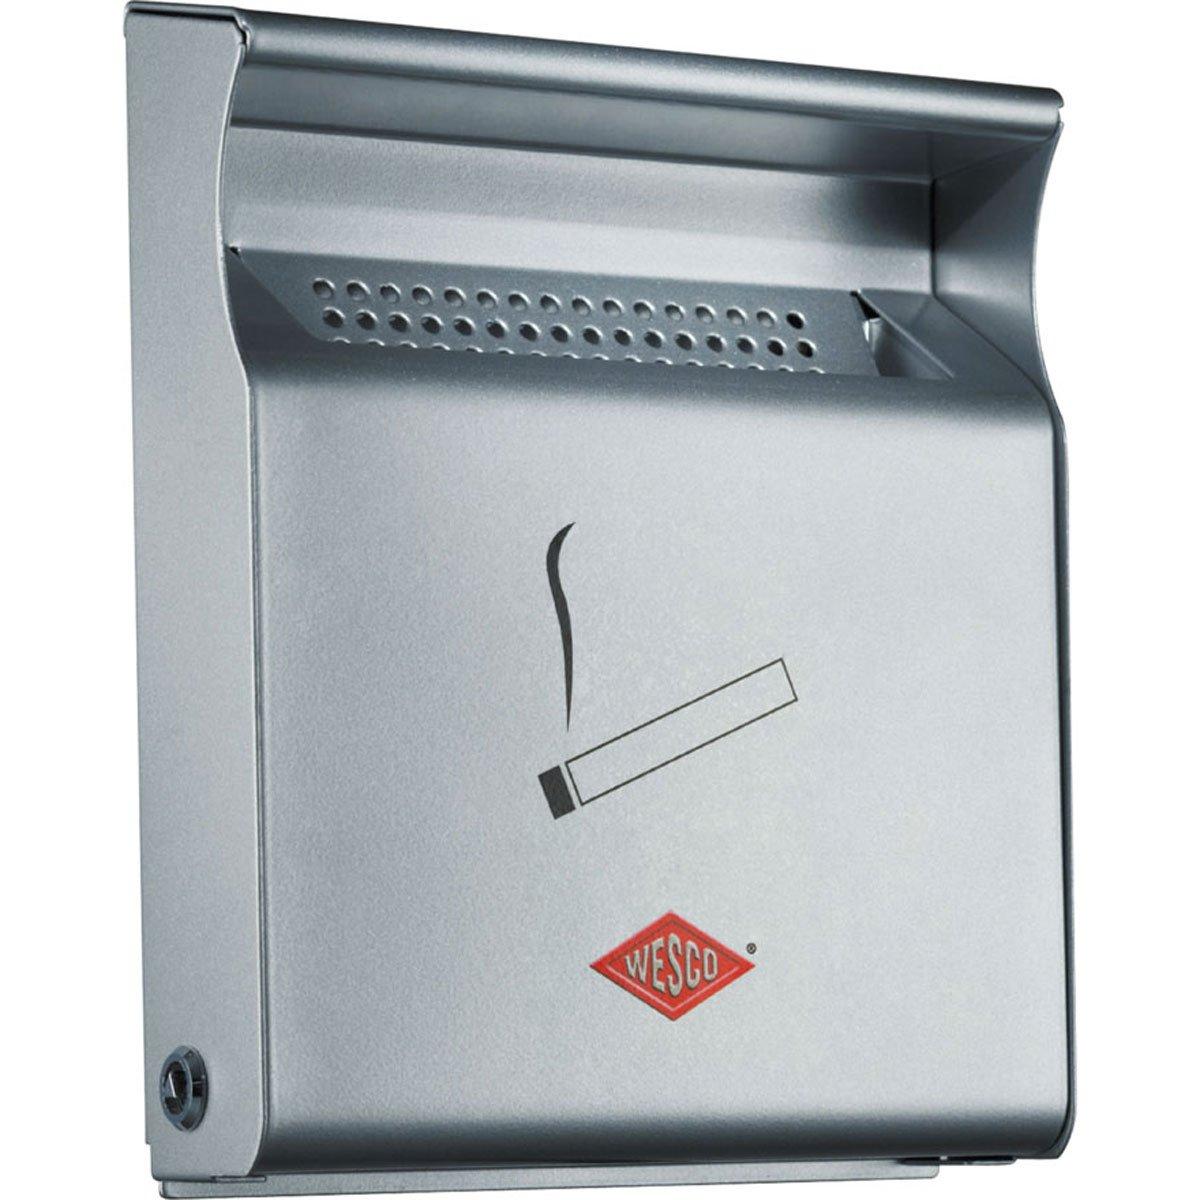 Wesco 395 001-11 - Portacenere da parete, colore: Argento